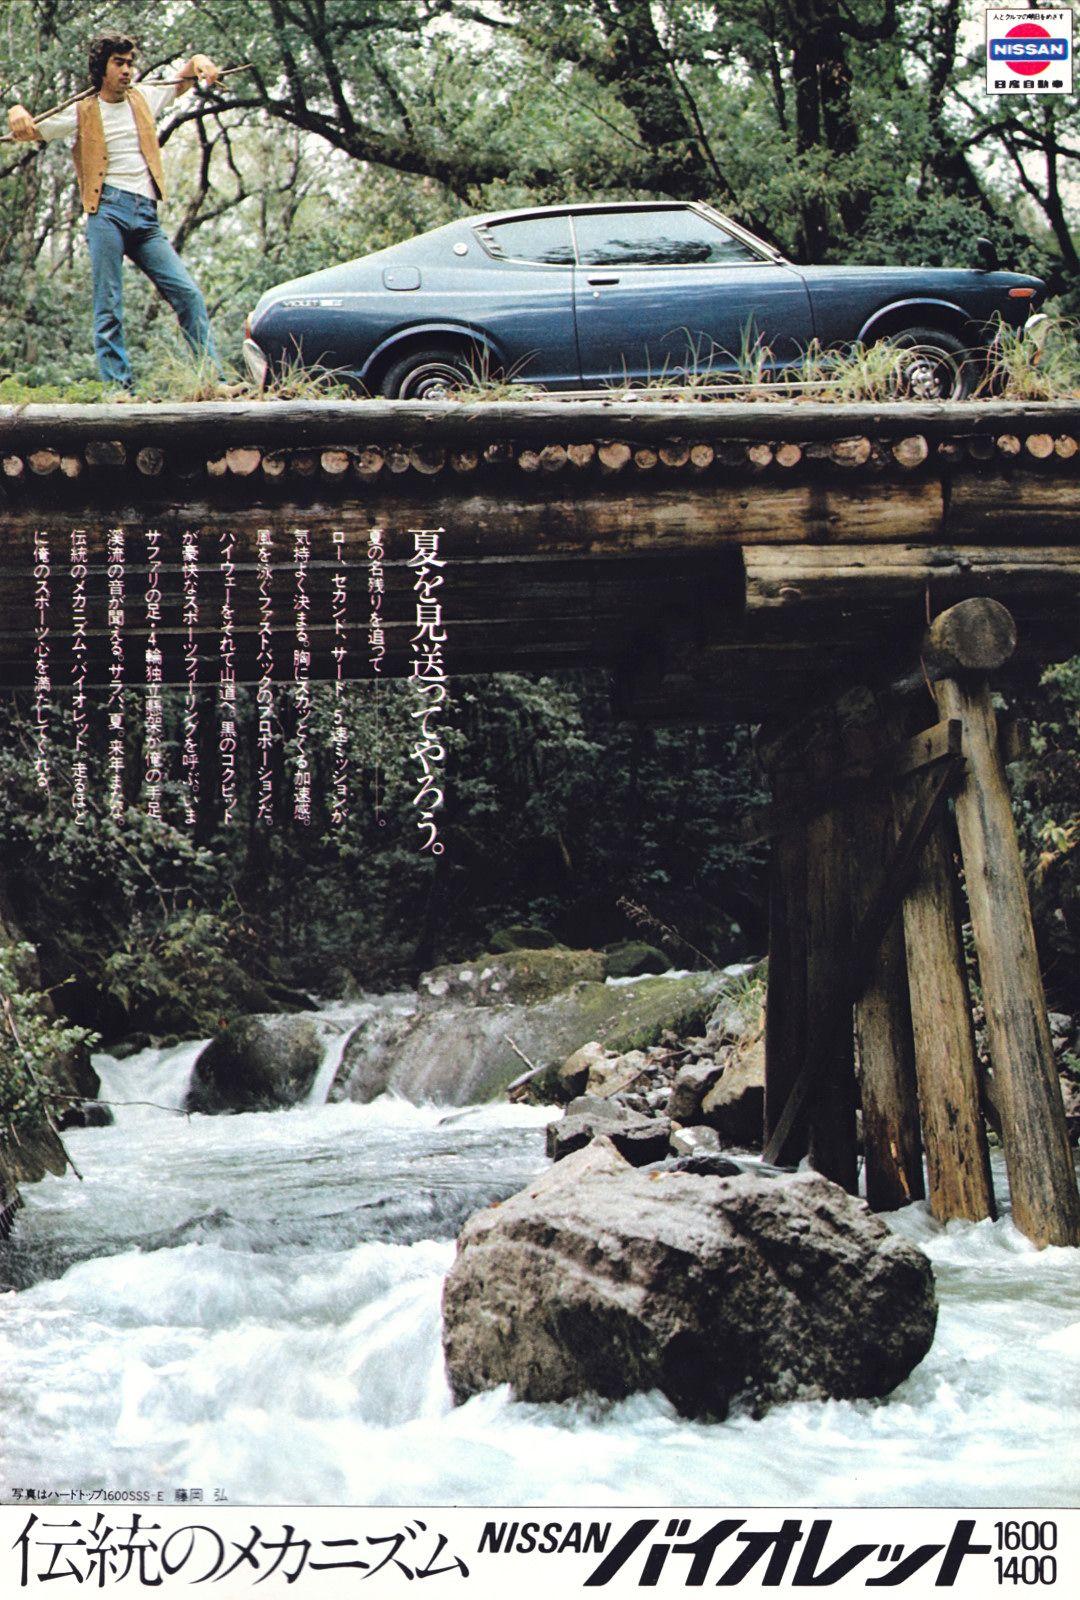 Nissan バイオレット 1975年 日産自動車 ハコスカ ケンメリ 日産